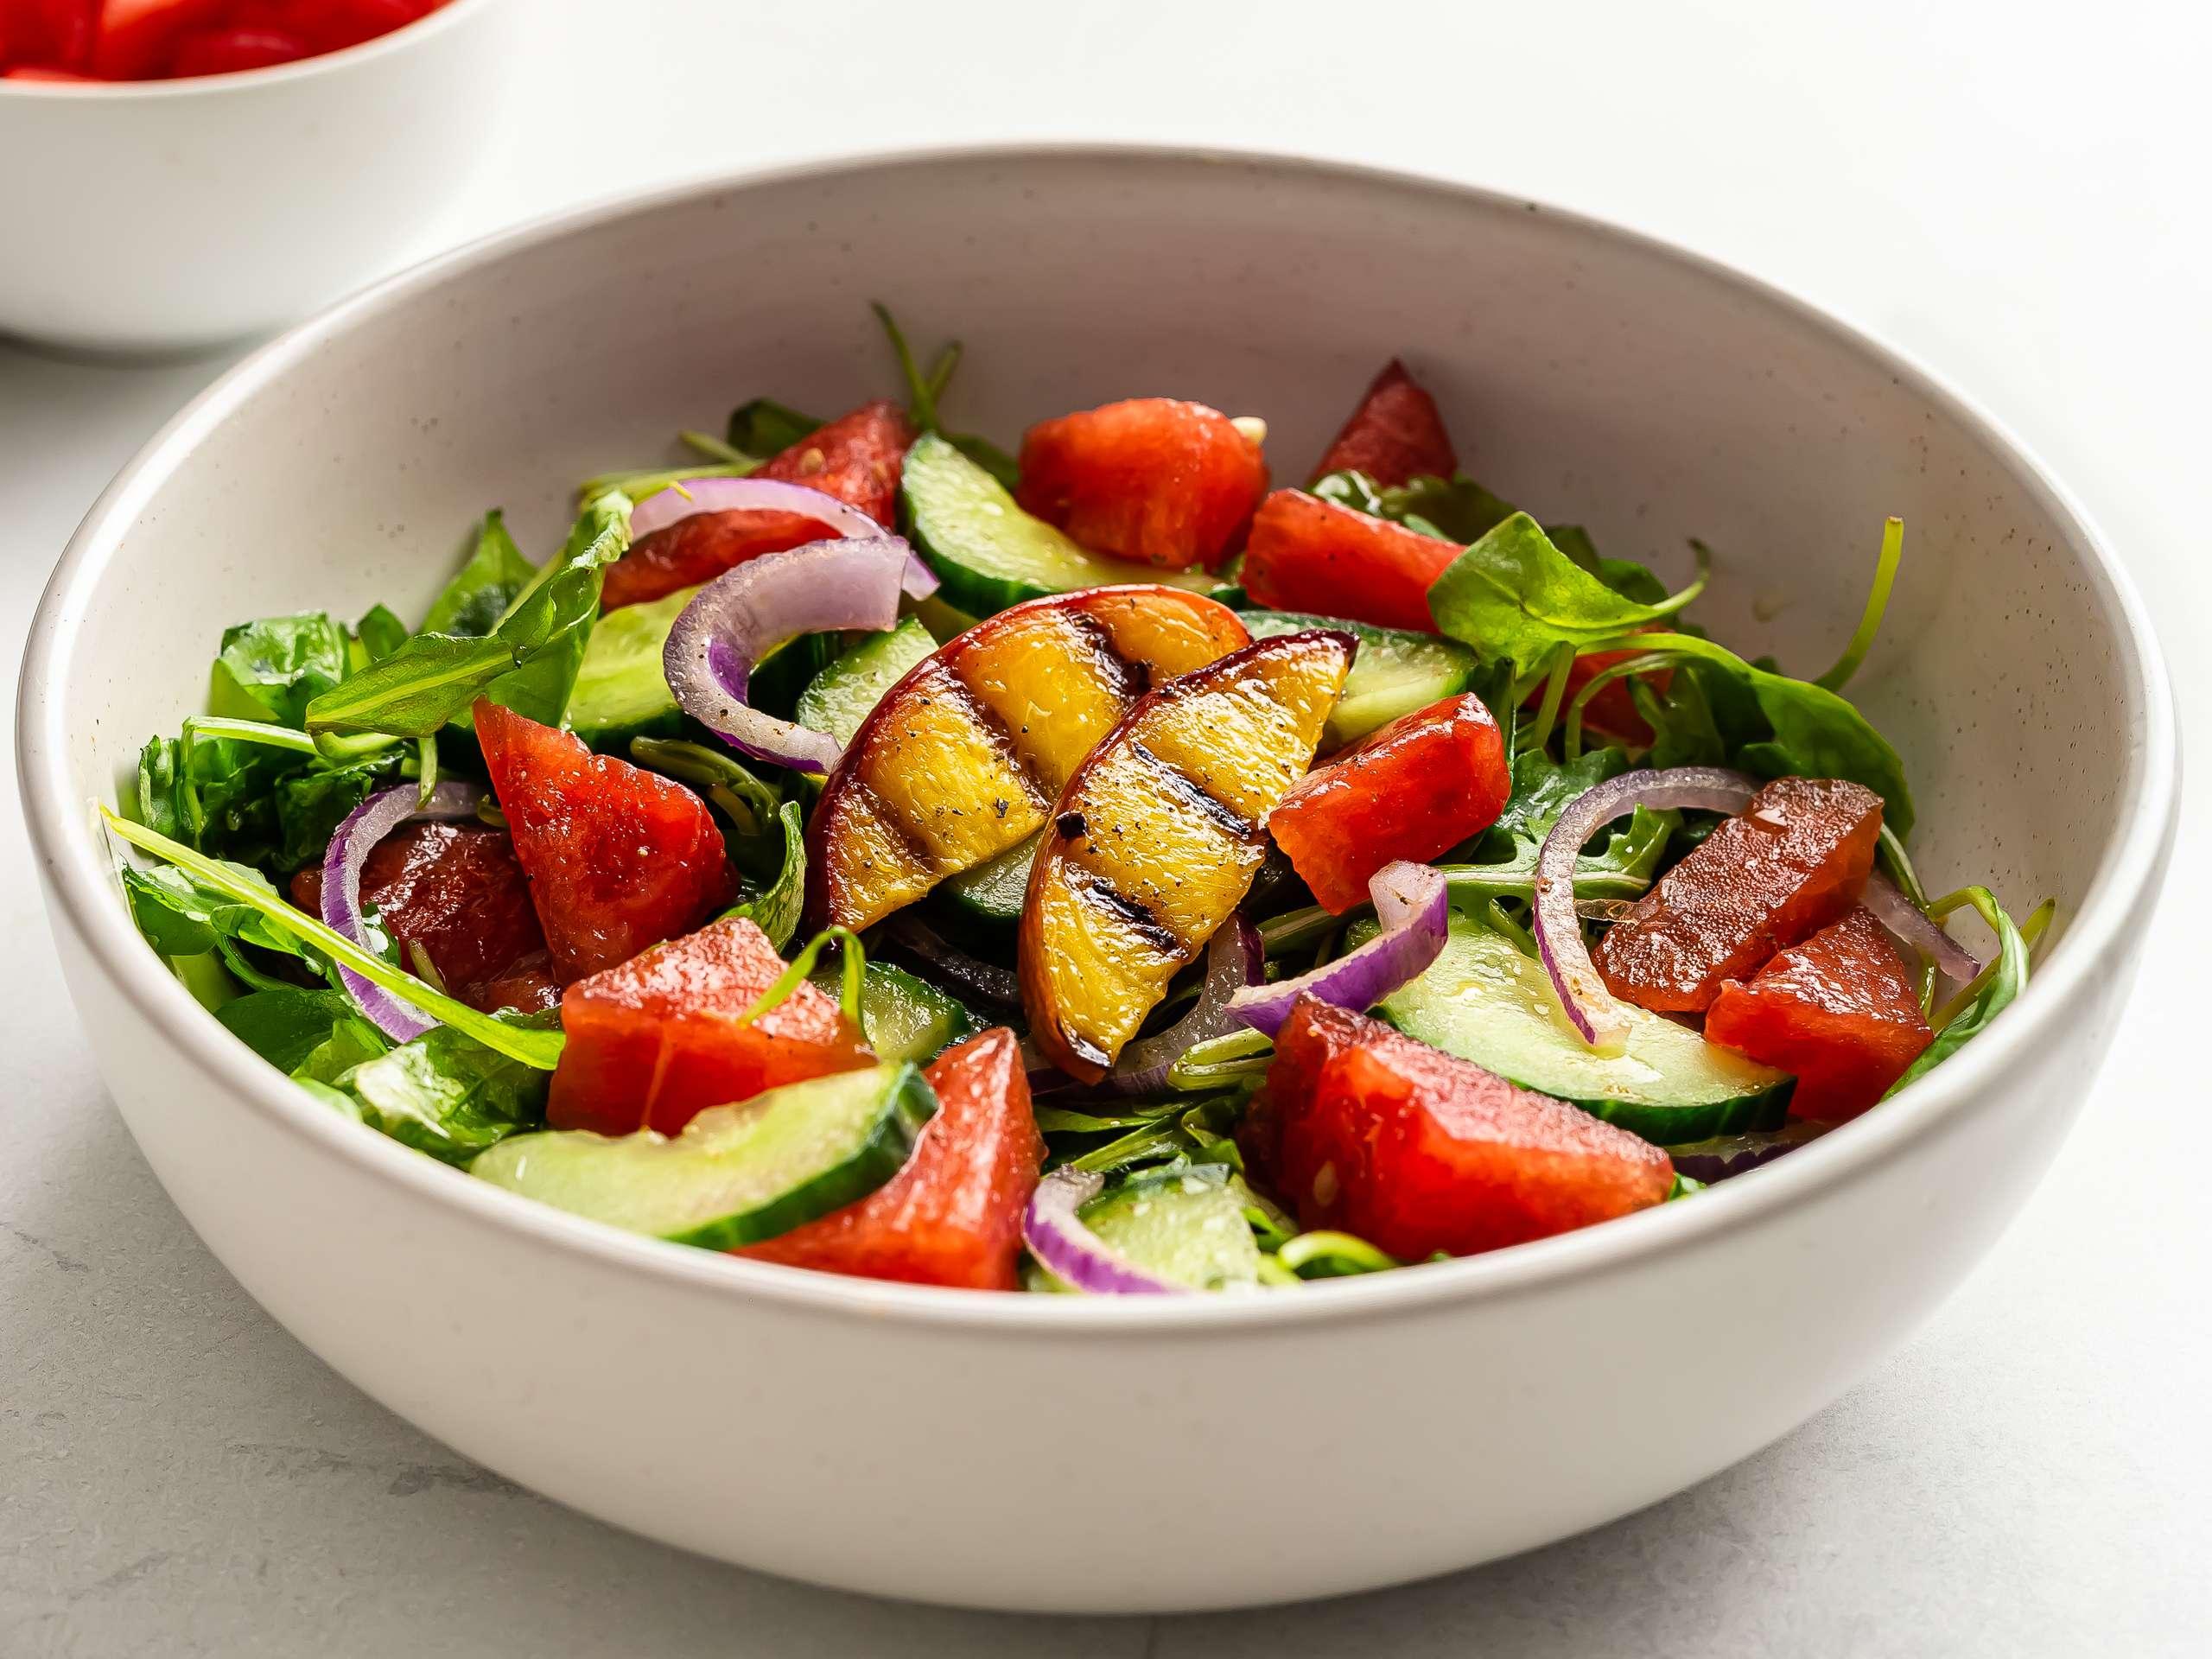 Watermelon Arugula and Grilled Peach Salad